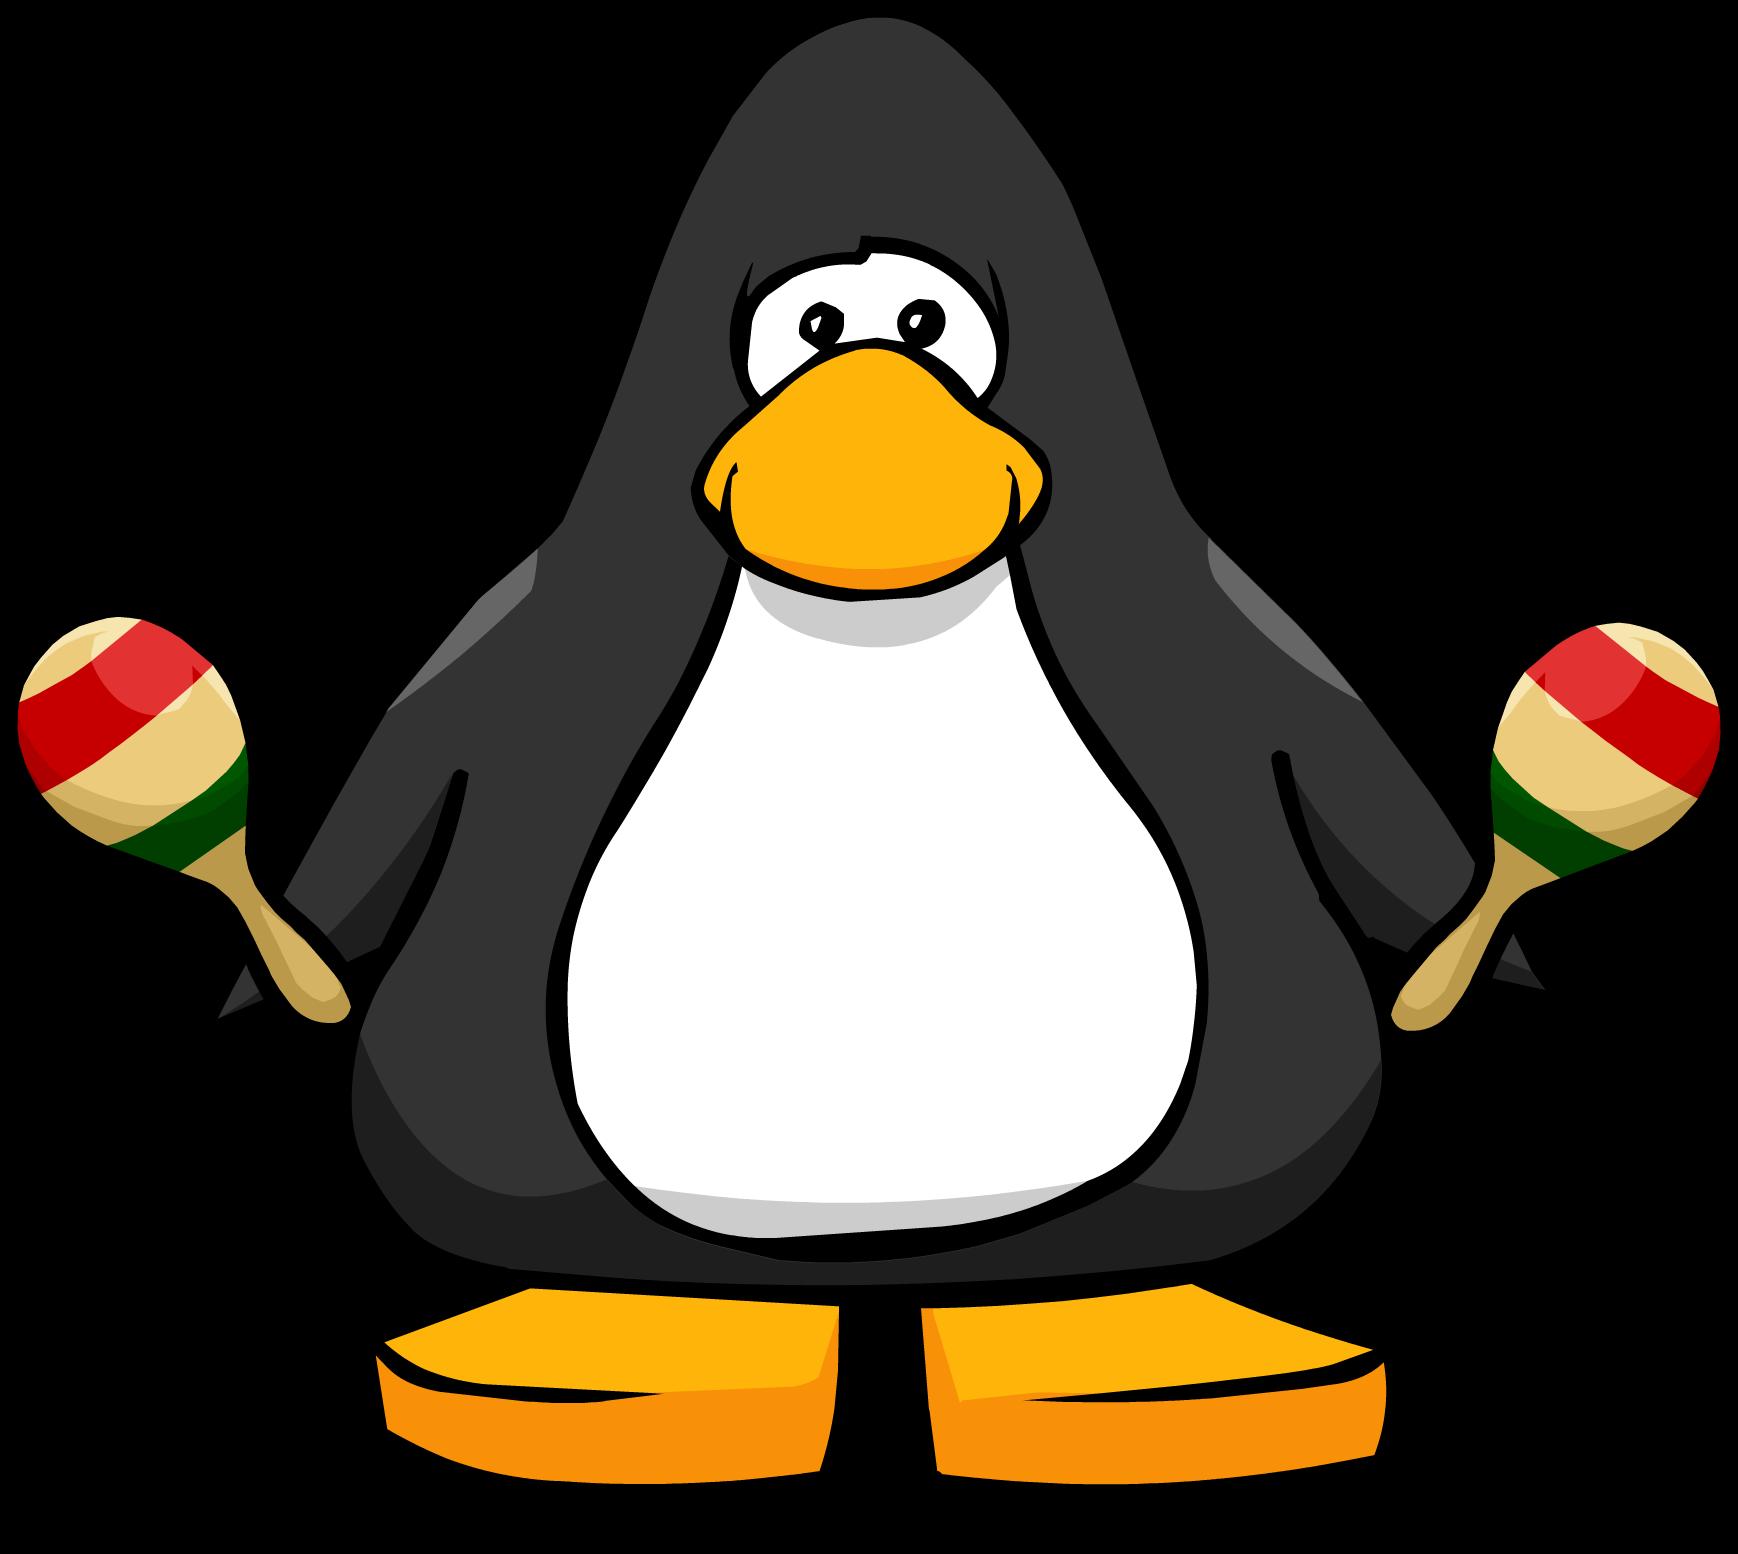 Maracas clipart club penguin. Image pair or png